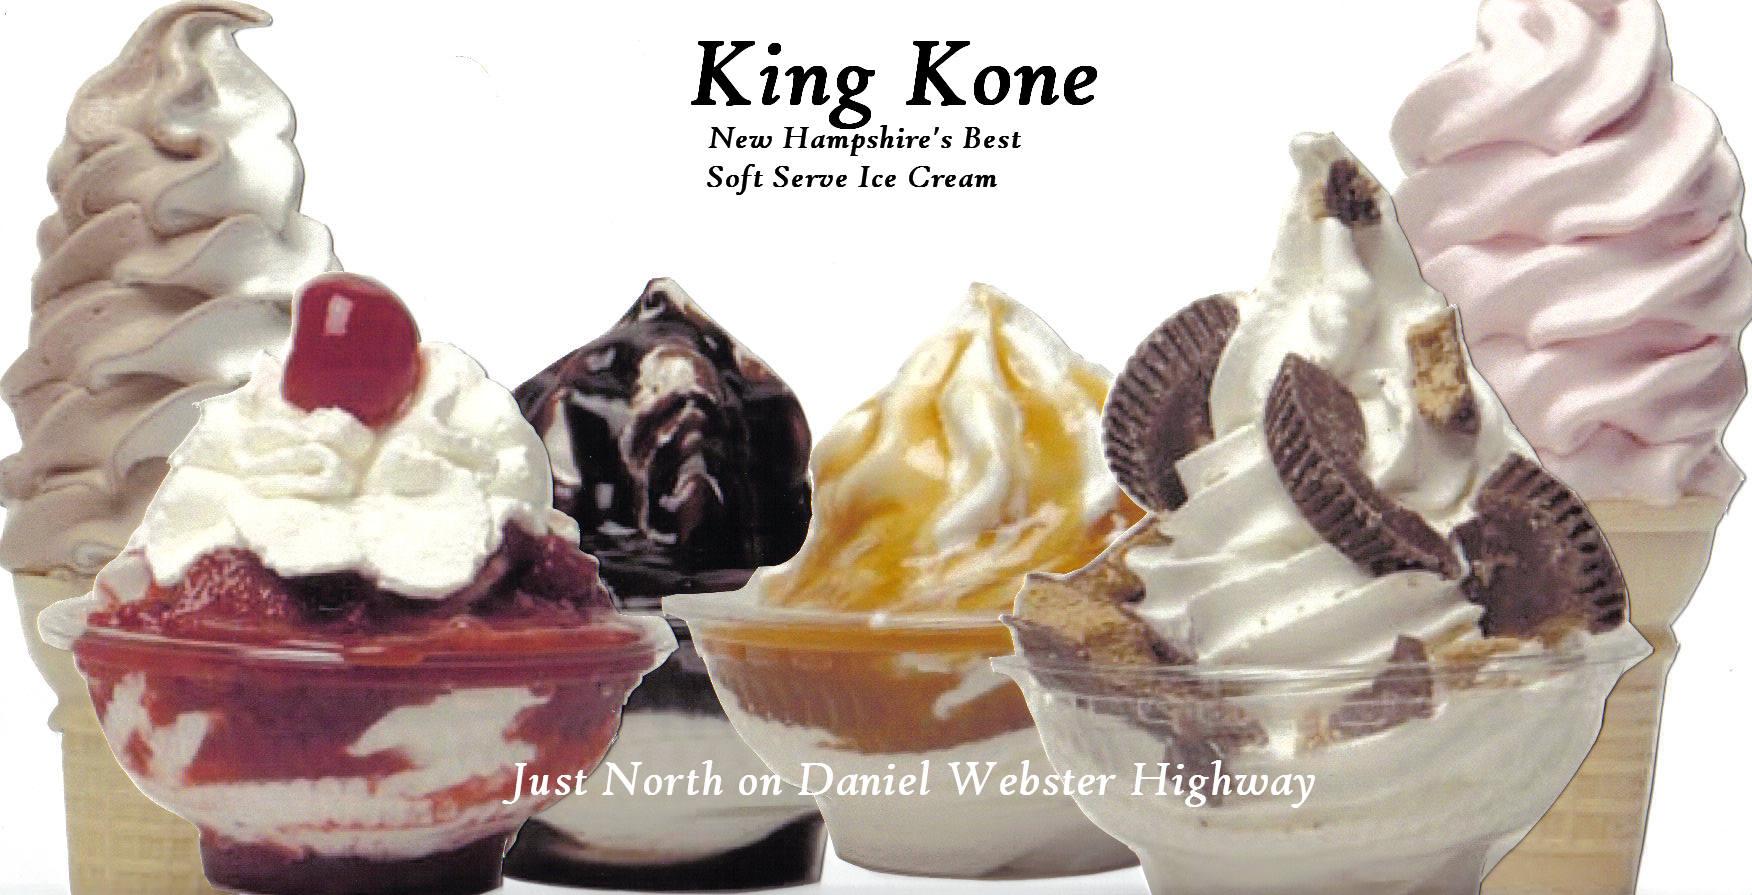 King Kone Cinemagic Ad Draft 1.jpg